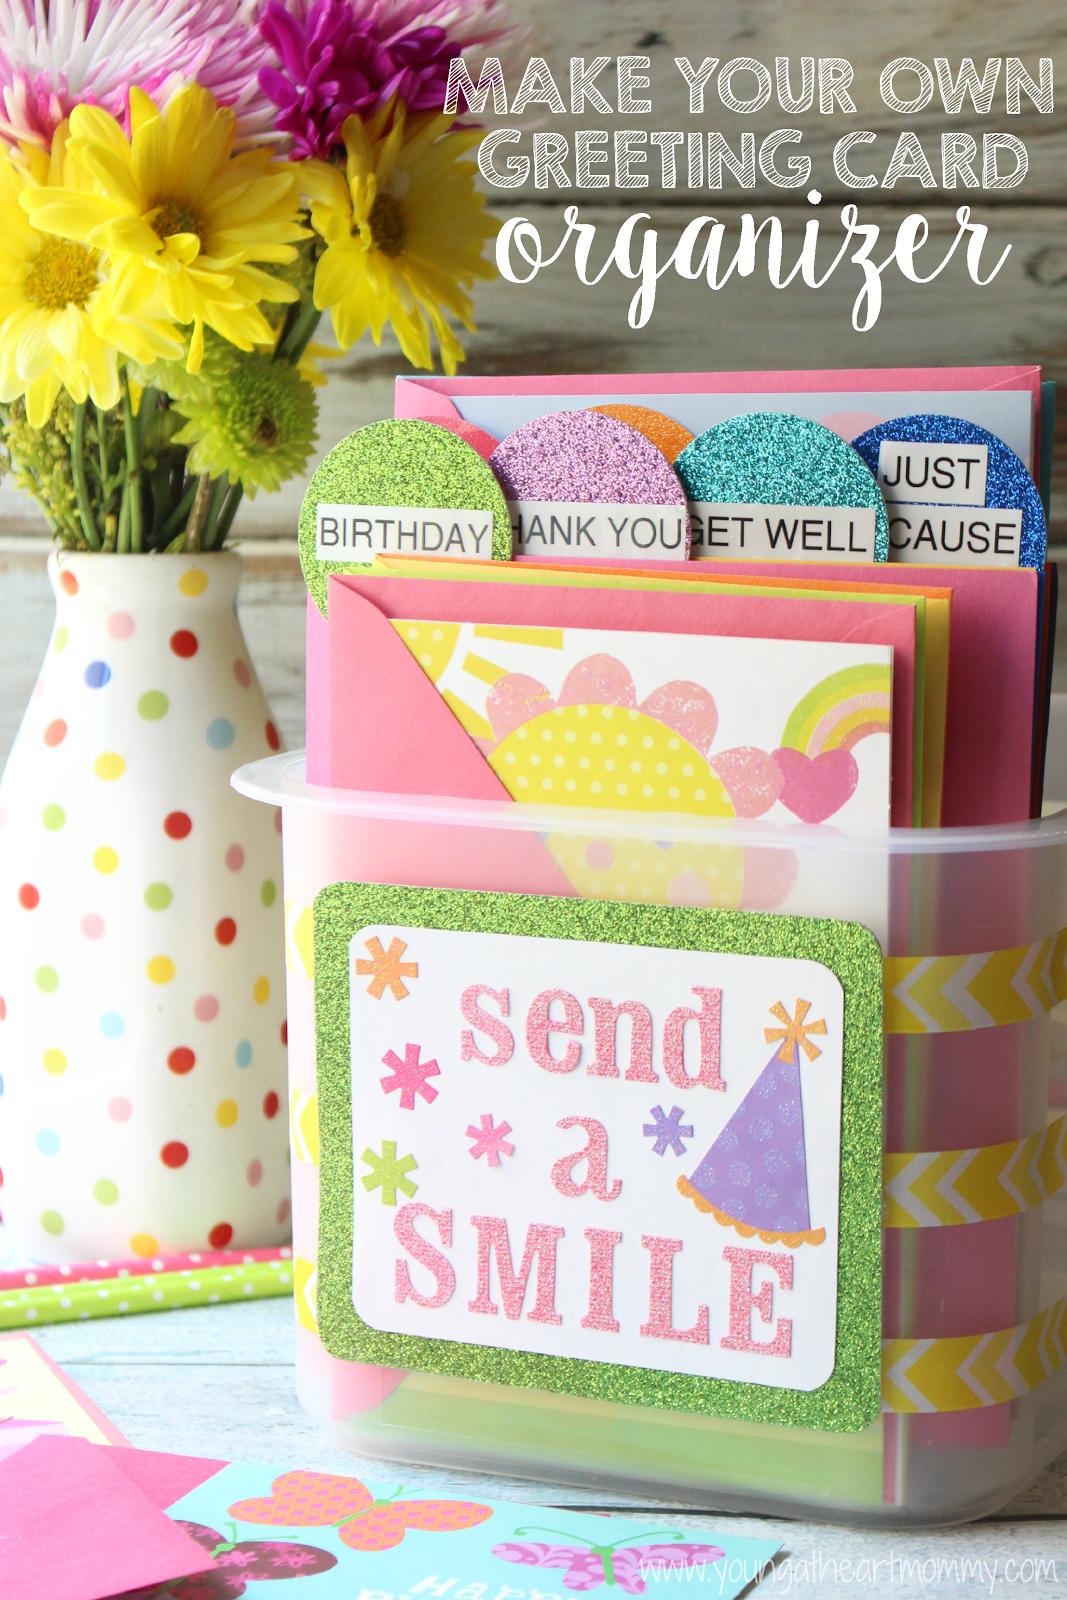 Diy greeting card organizer sendsmiles ad cbias organizing diy greeting card organizer sendsmiles ad cbias m4hsunfo